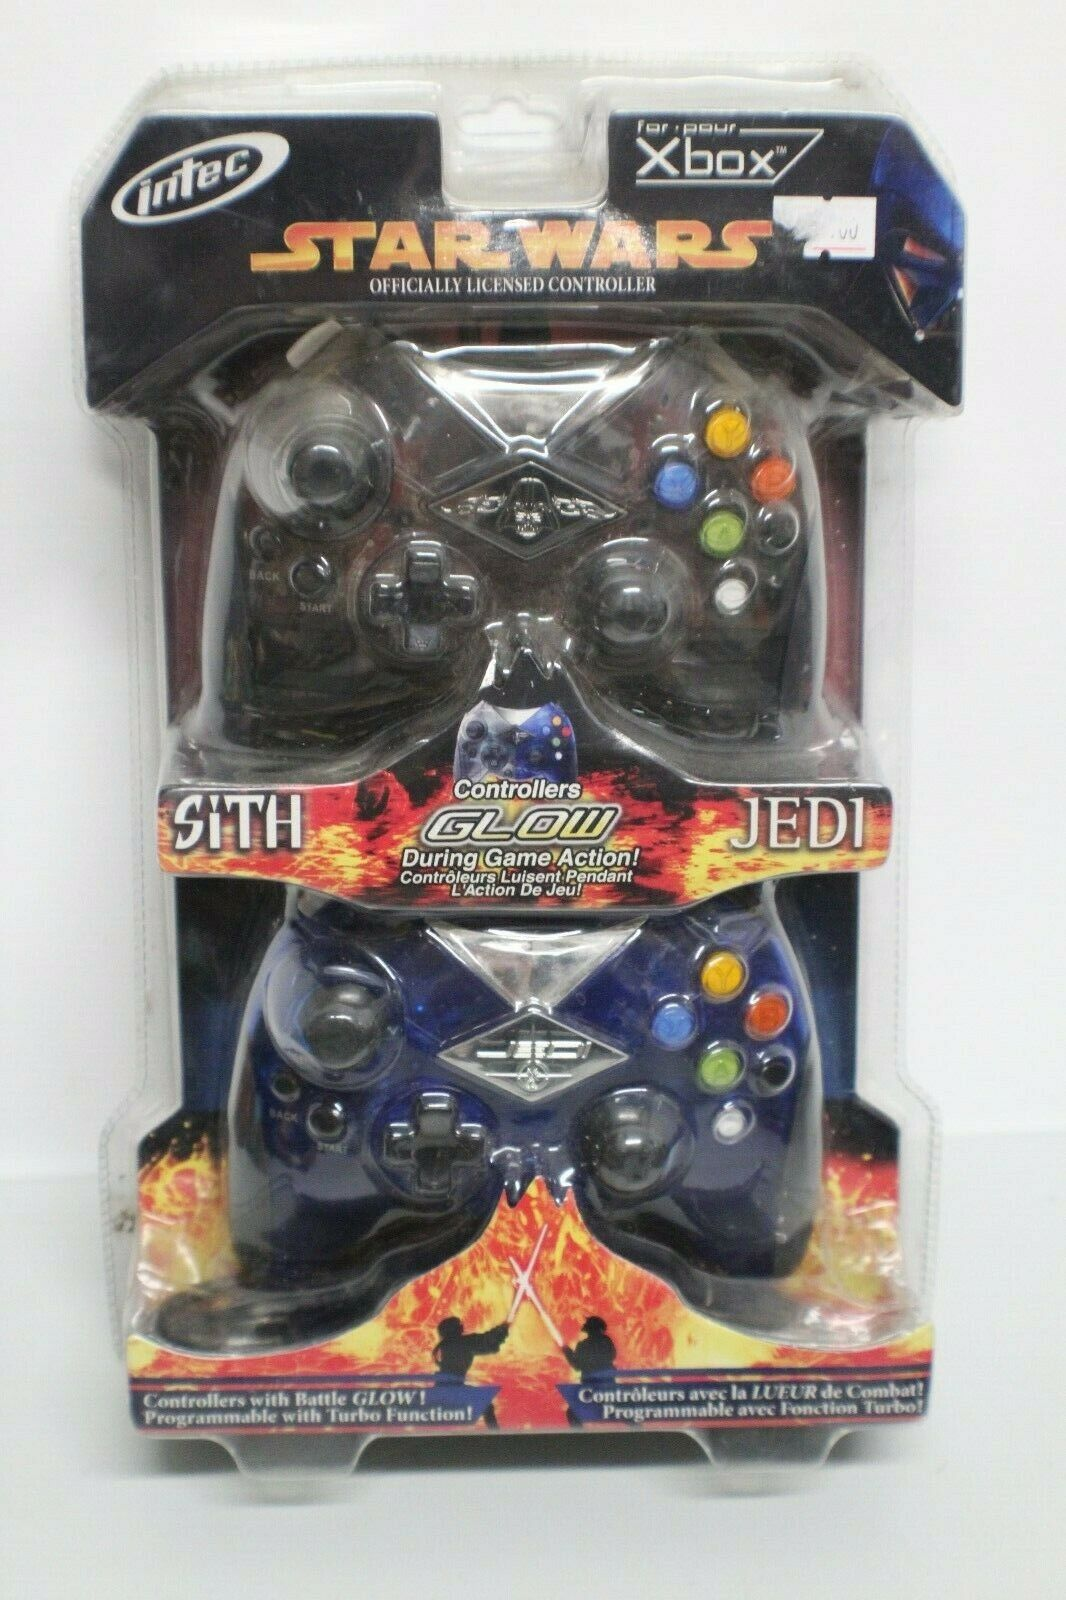 Star Wars Sith And Jedi Controller S Xbox Wiki Fandom